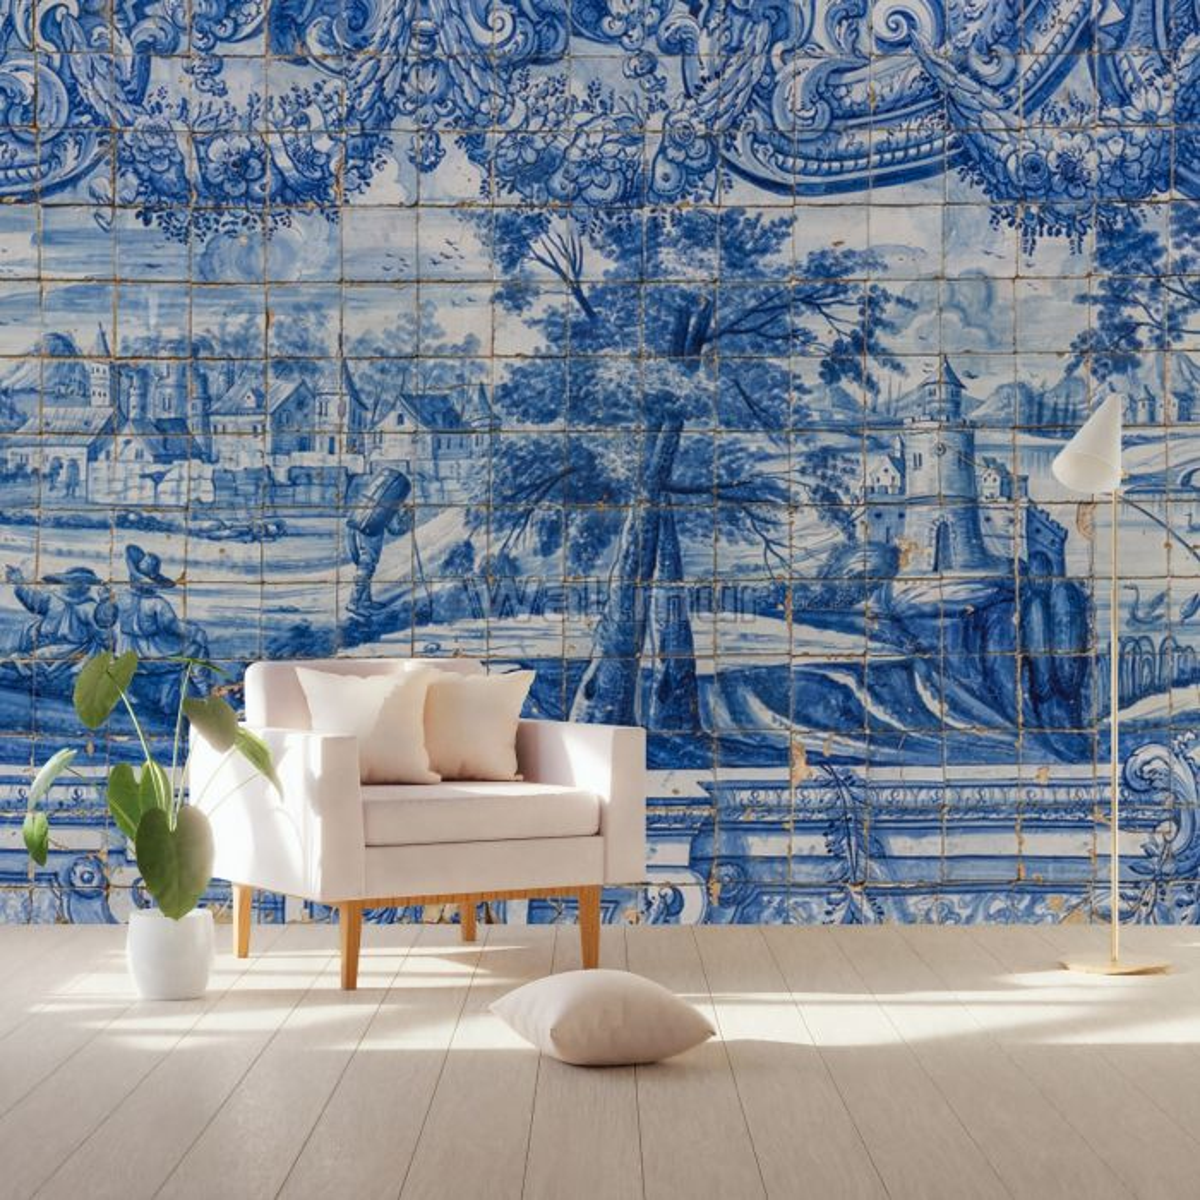 Blue Chinoiserie with Brush Tile Pattern Wallpaper Mural